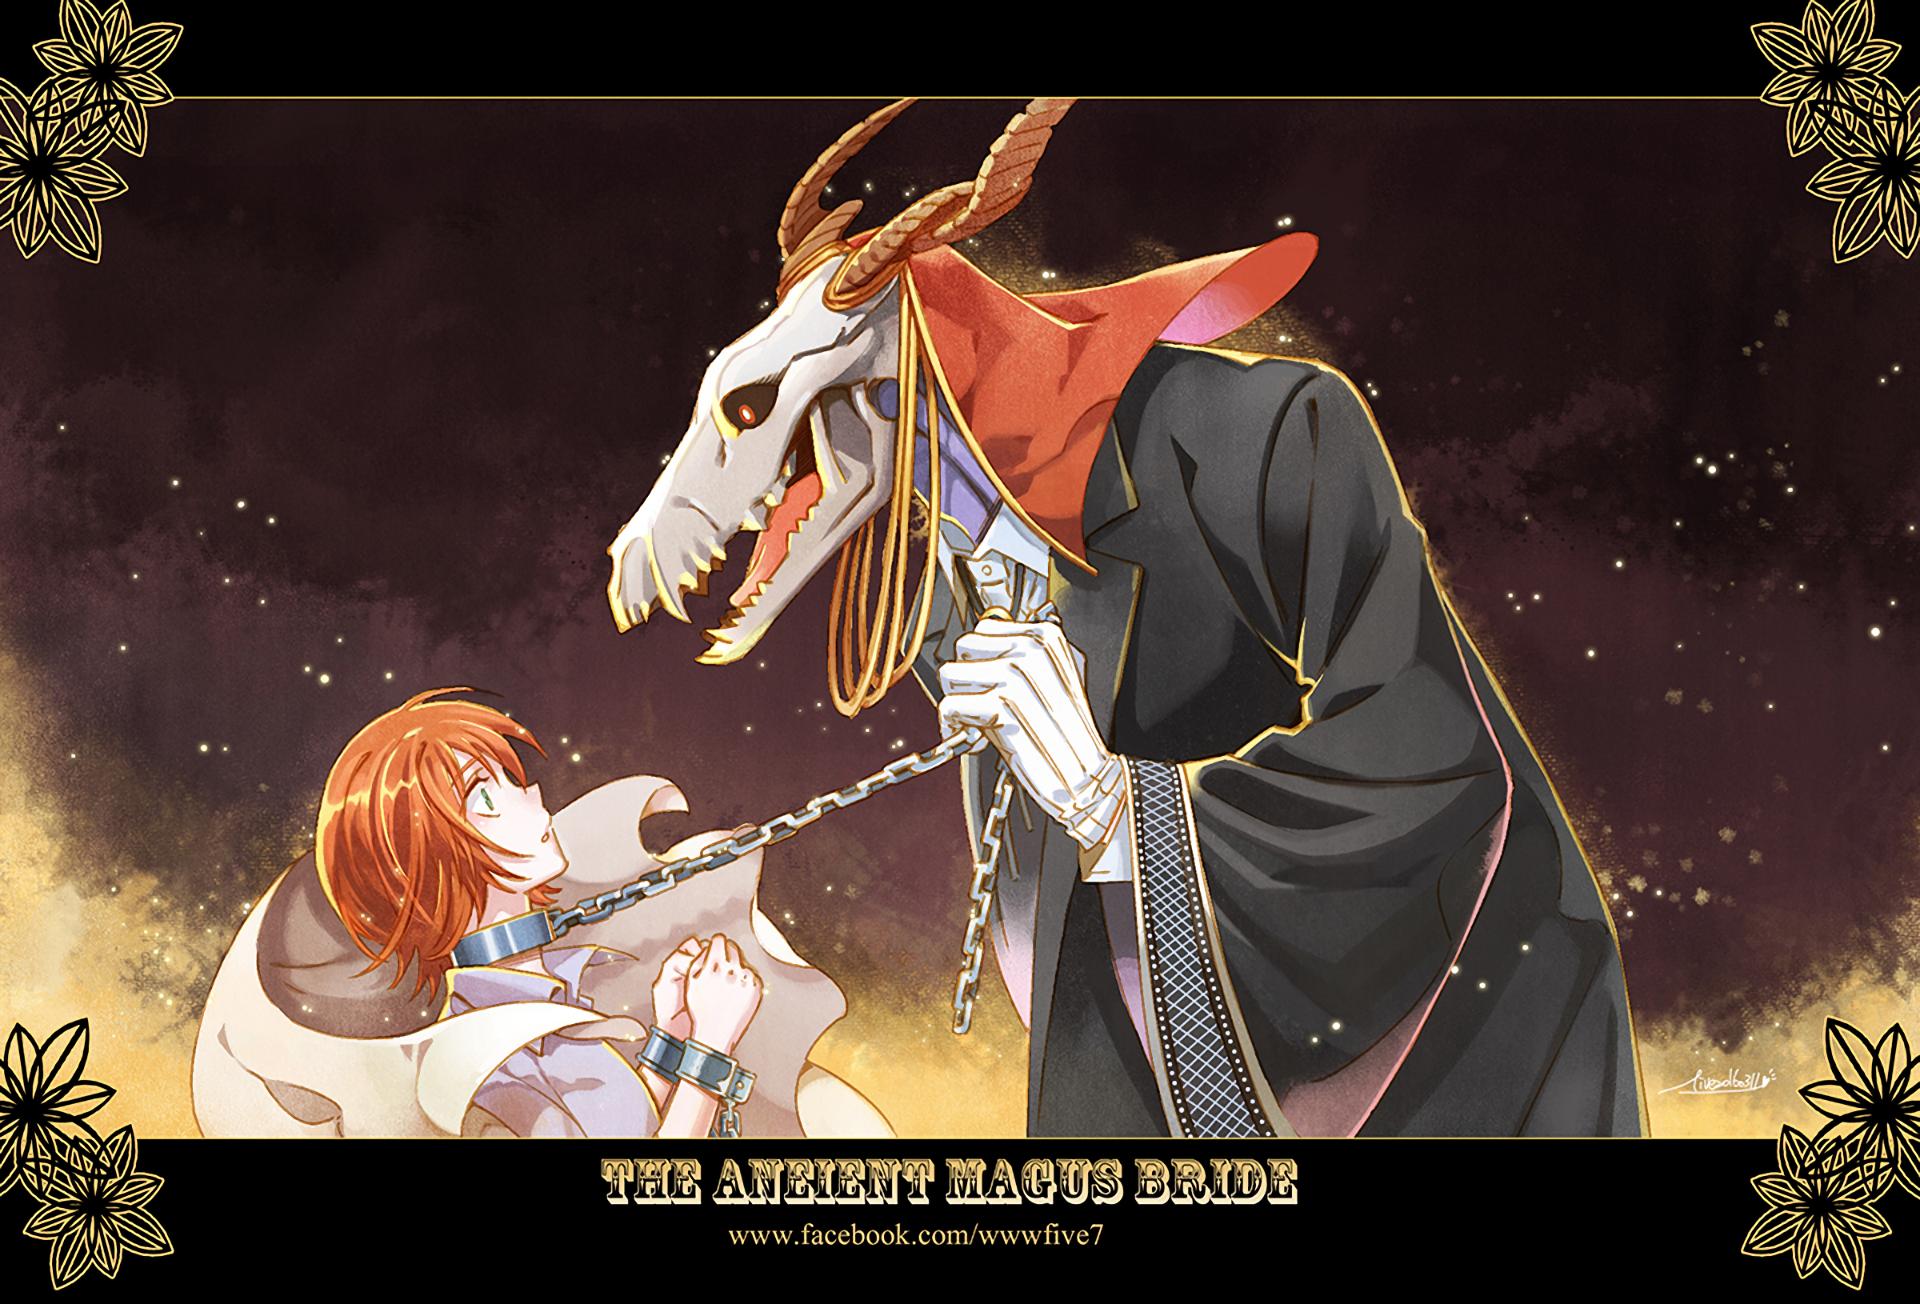 Anime The Ancient Magus Bride Chise Hatori Elias Ainsworth